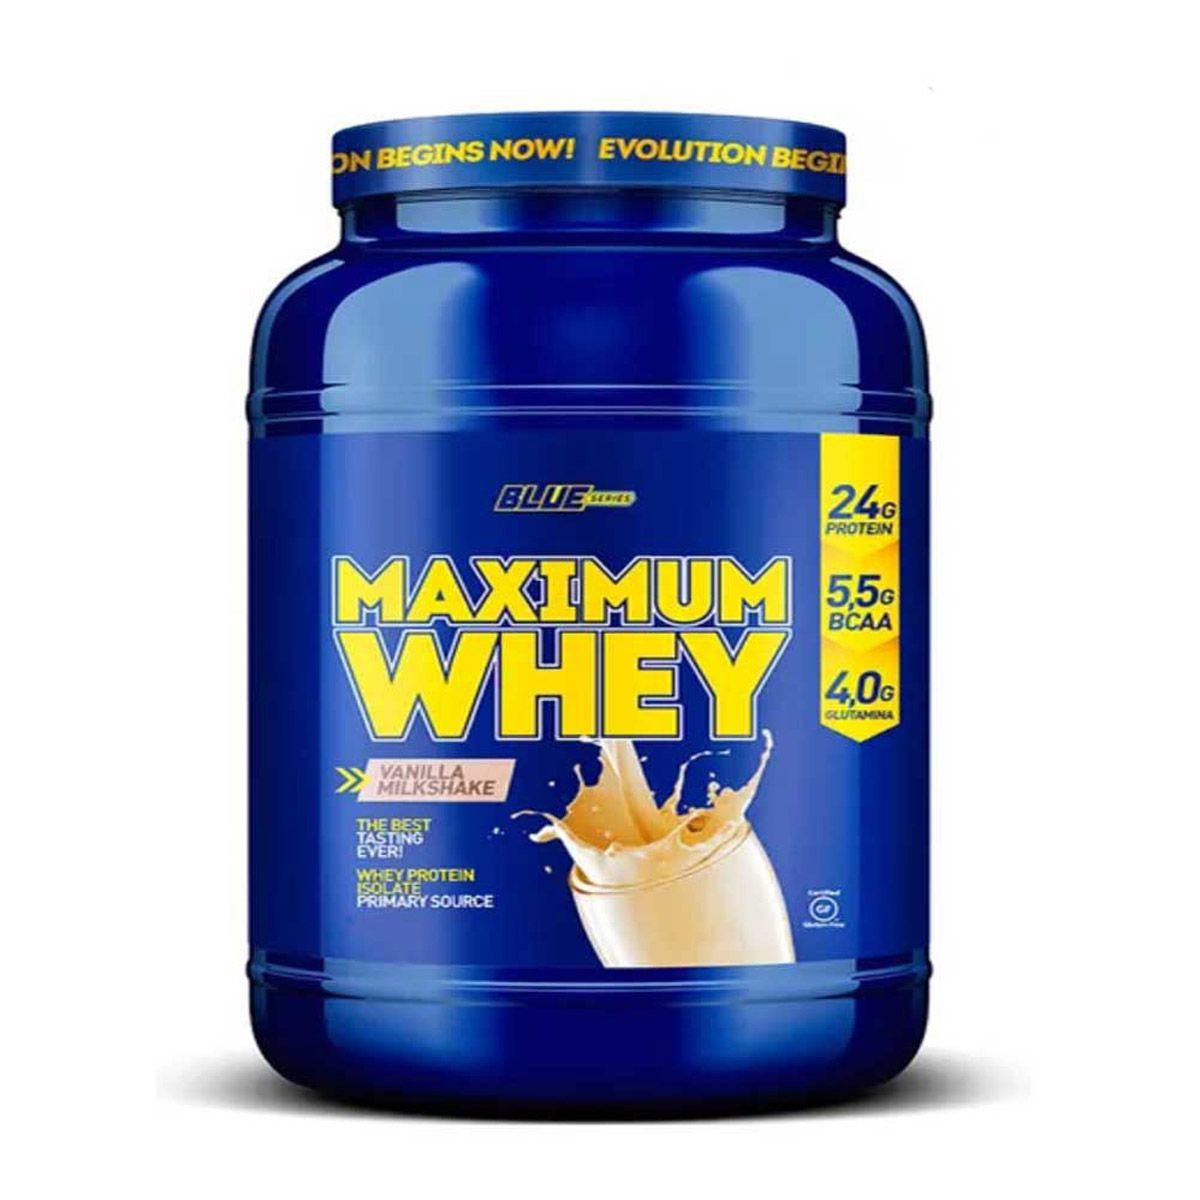 Maximum Whey - 2200g - Blue Series